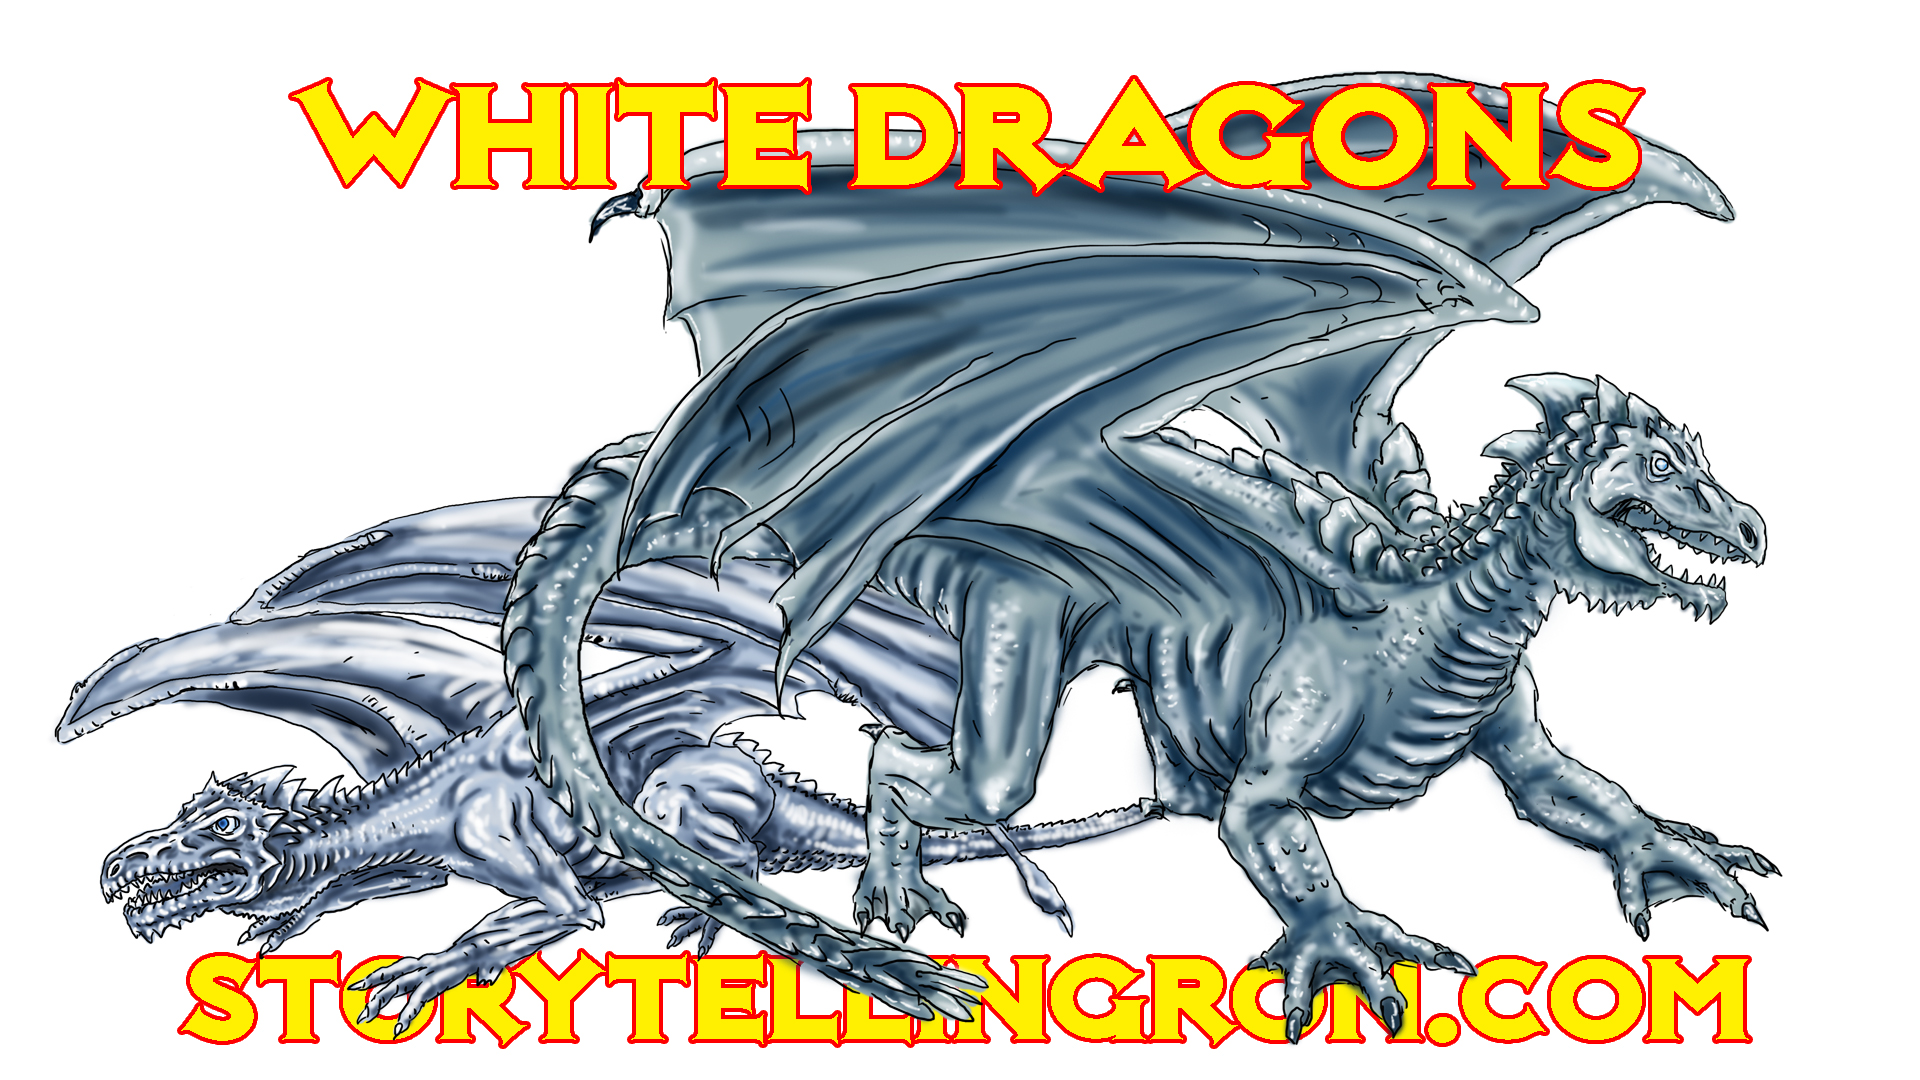 PROMO GROUP SHOT white dragons